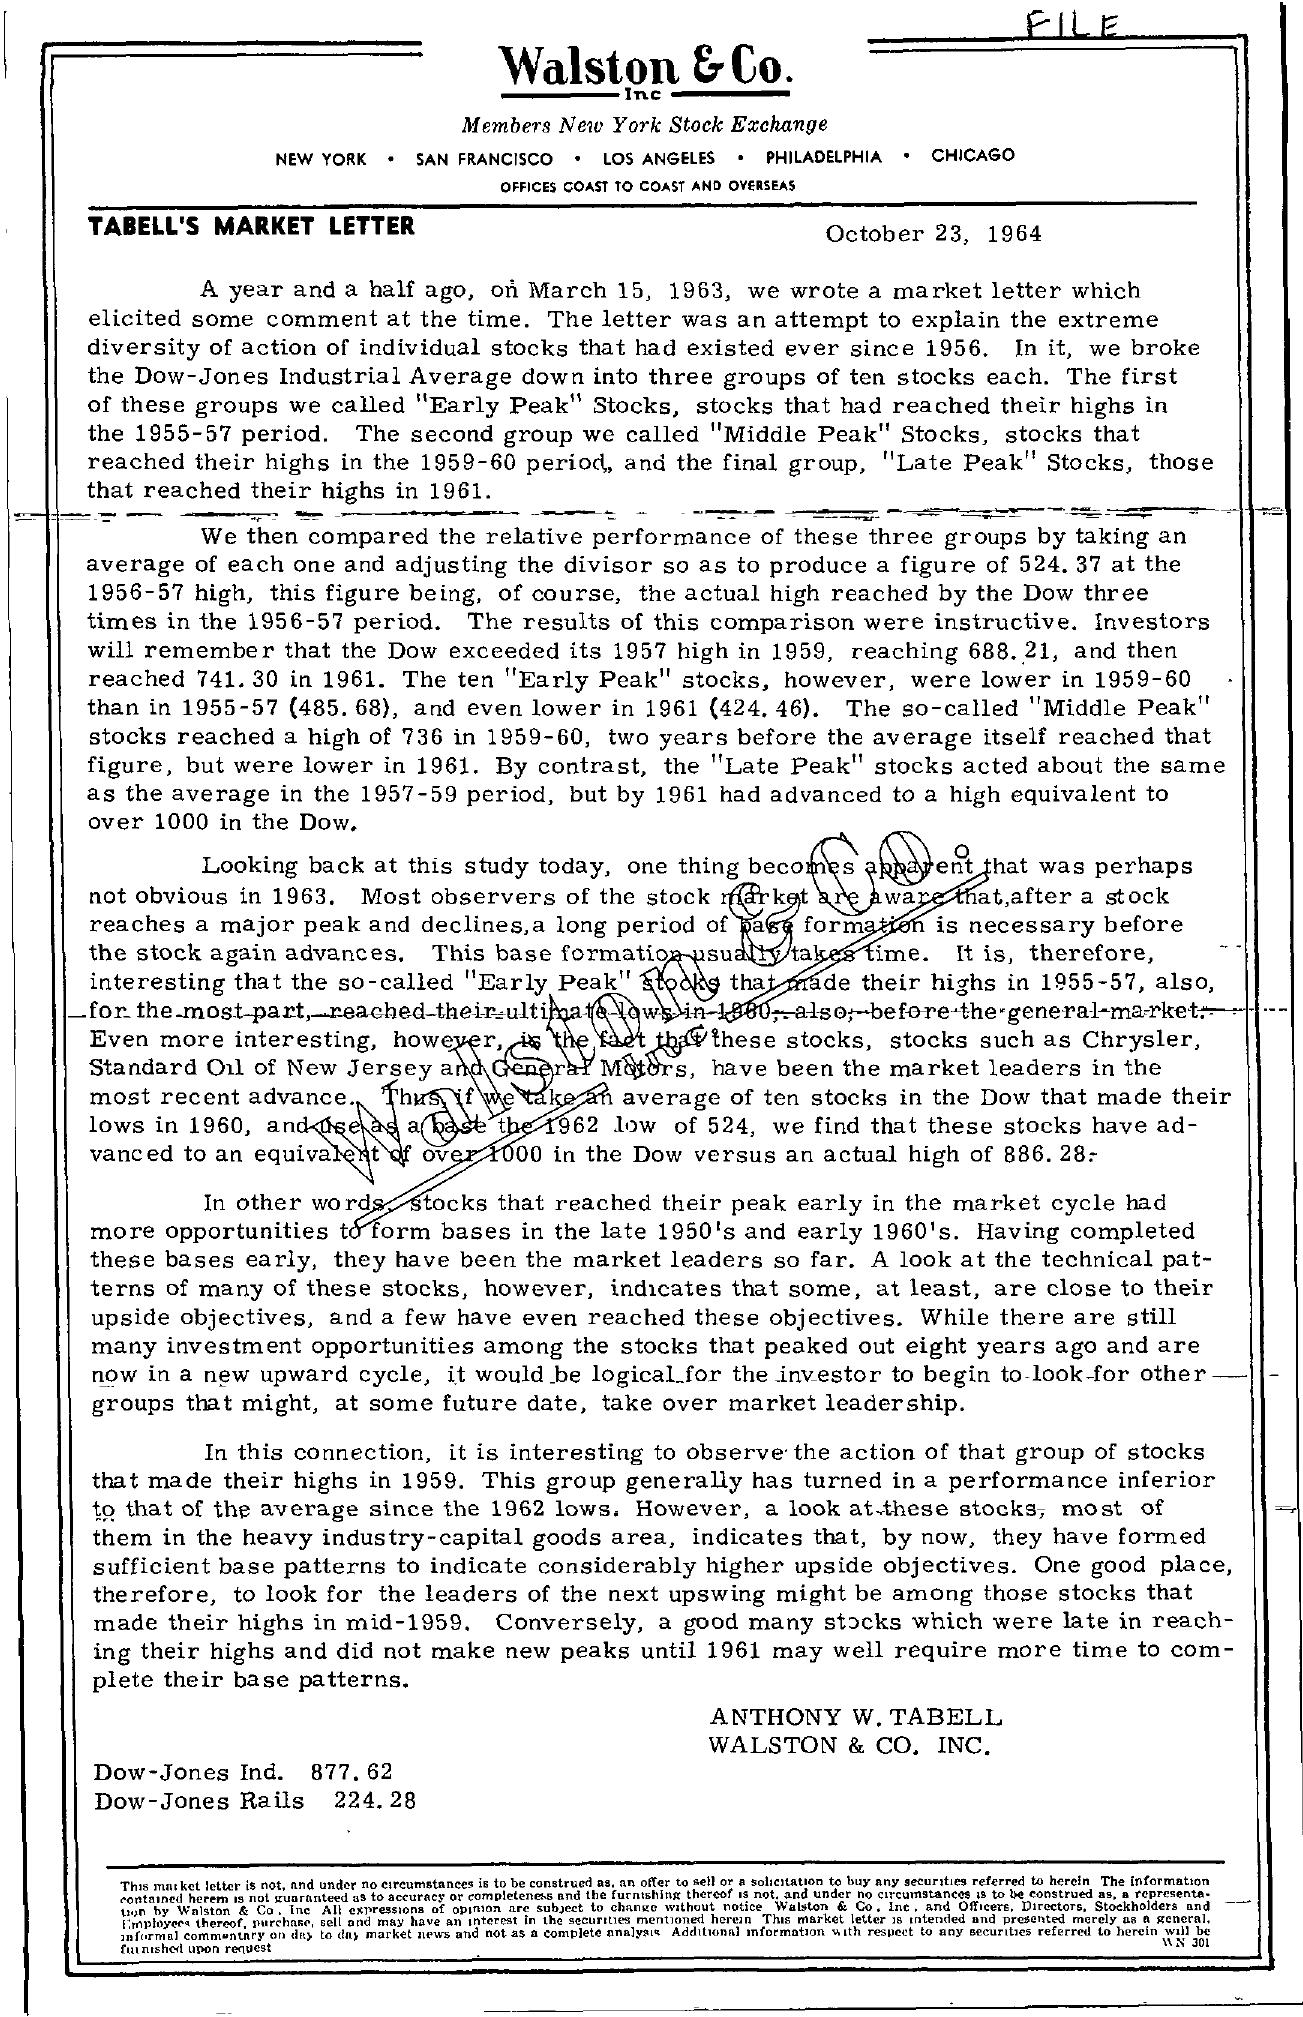 Tabell's Market Letter - October 23, 1964